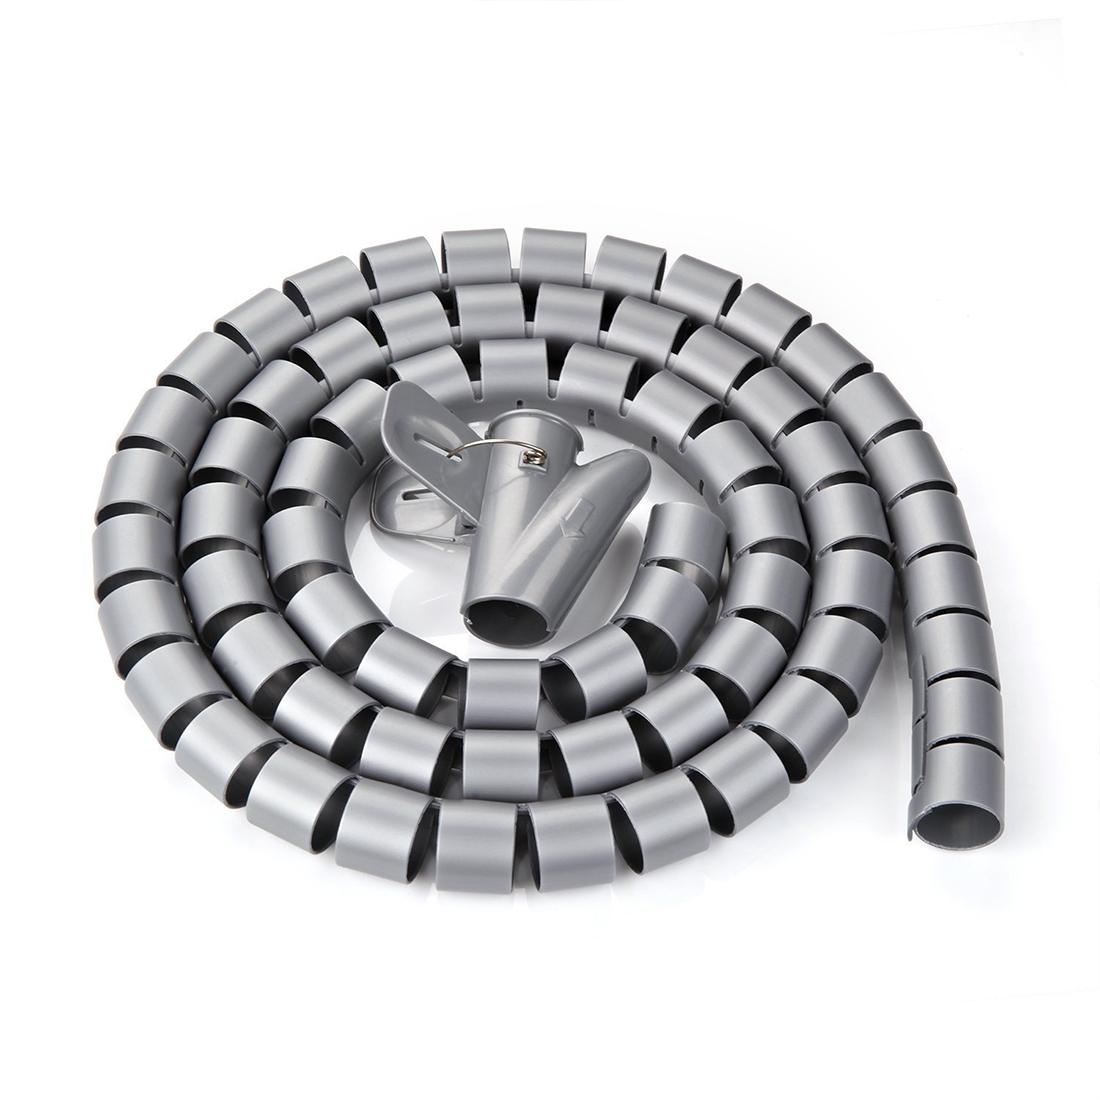 Unique Bargains 10mm Flexible Spiral Tube Cable Wire Wrap Computer Manage Cord Gray 5M w Clip